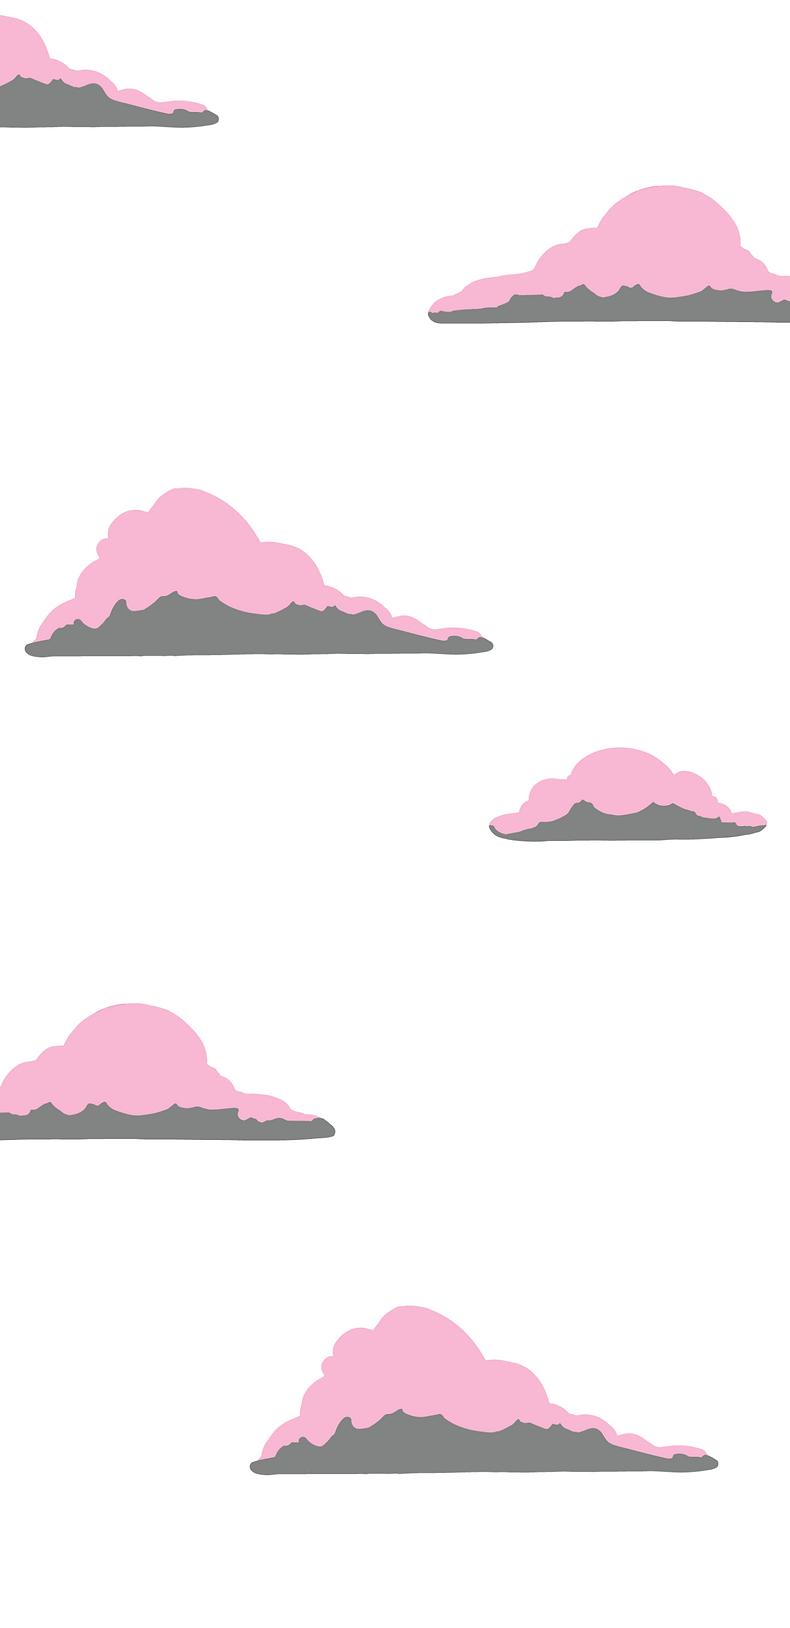 CloudbackgroundABoutUspageNhilist.png